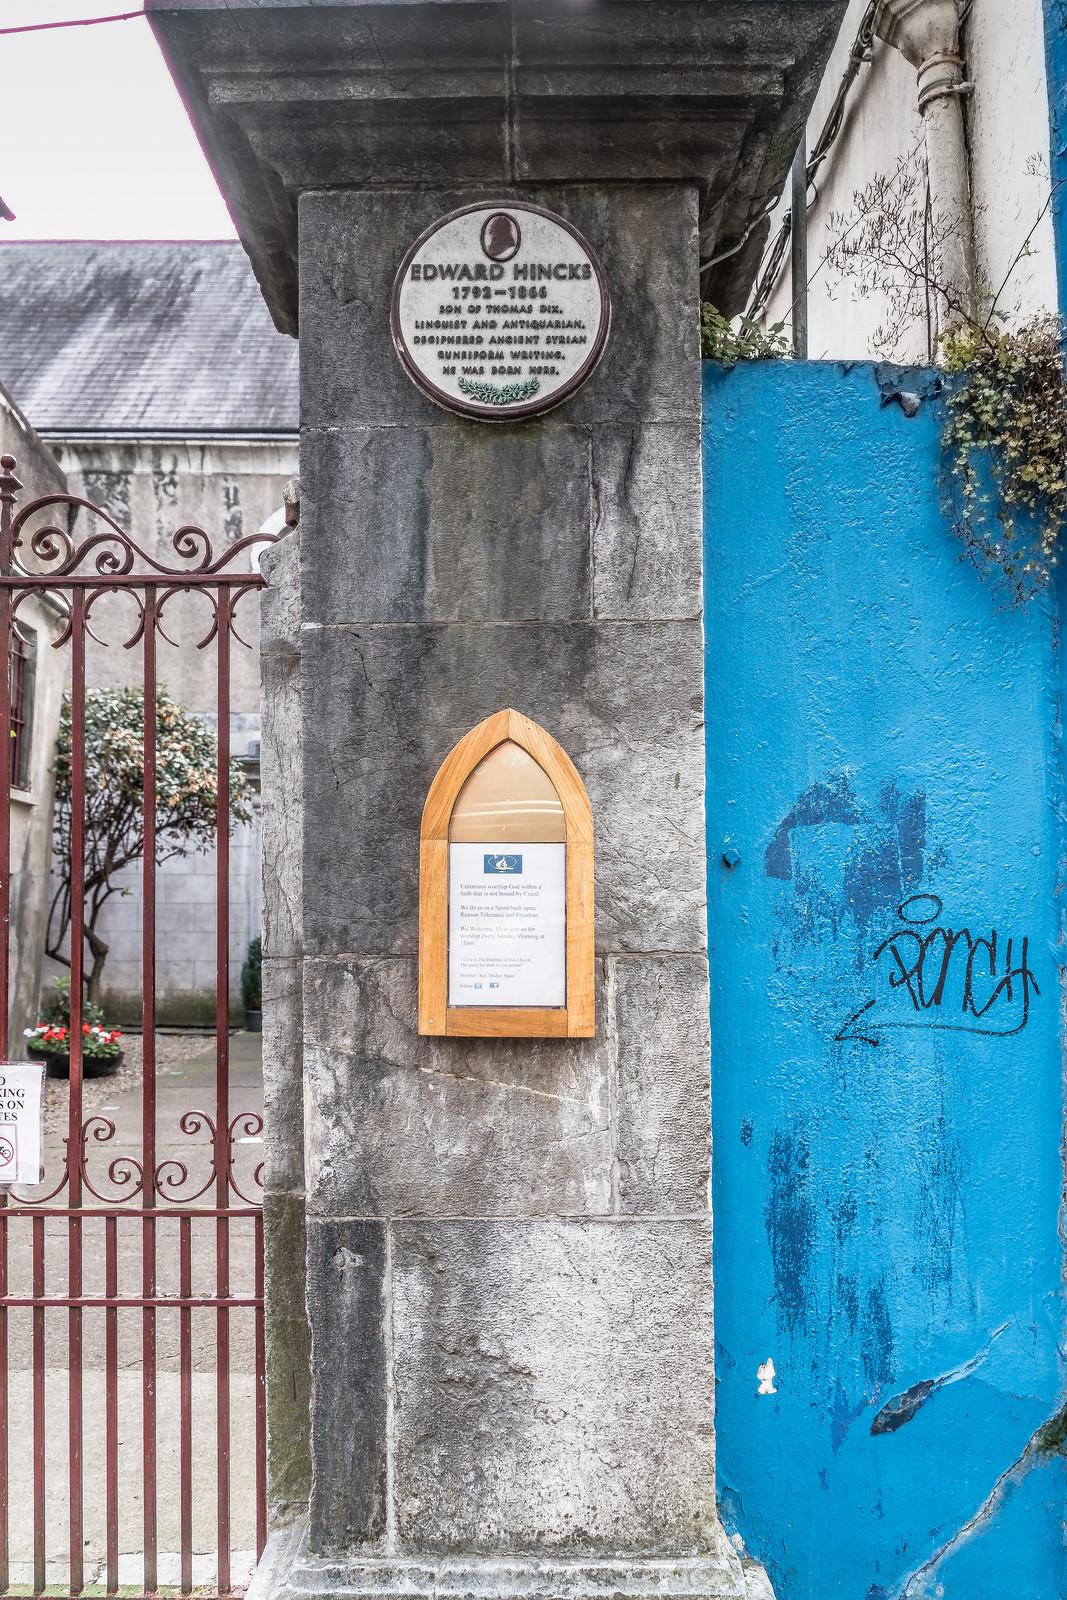 PLAQUE ON PRINCE'S STREET OUTSIDE UNITARIAN CHURCH BESIDE STARBUCKS [EDWARD HINCKS]-122674